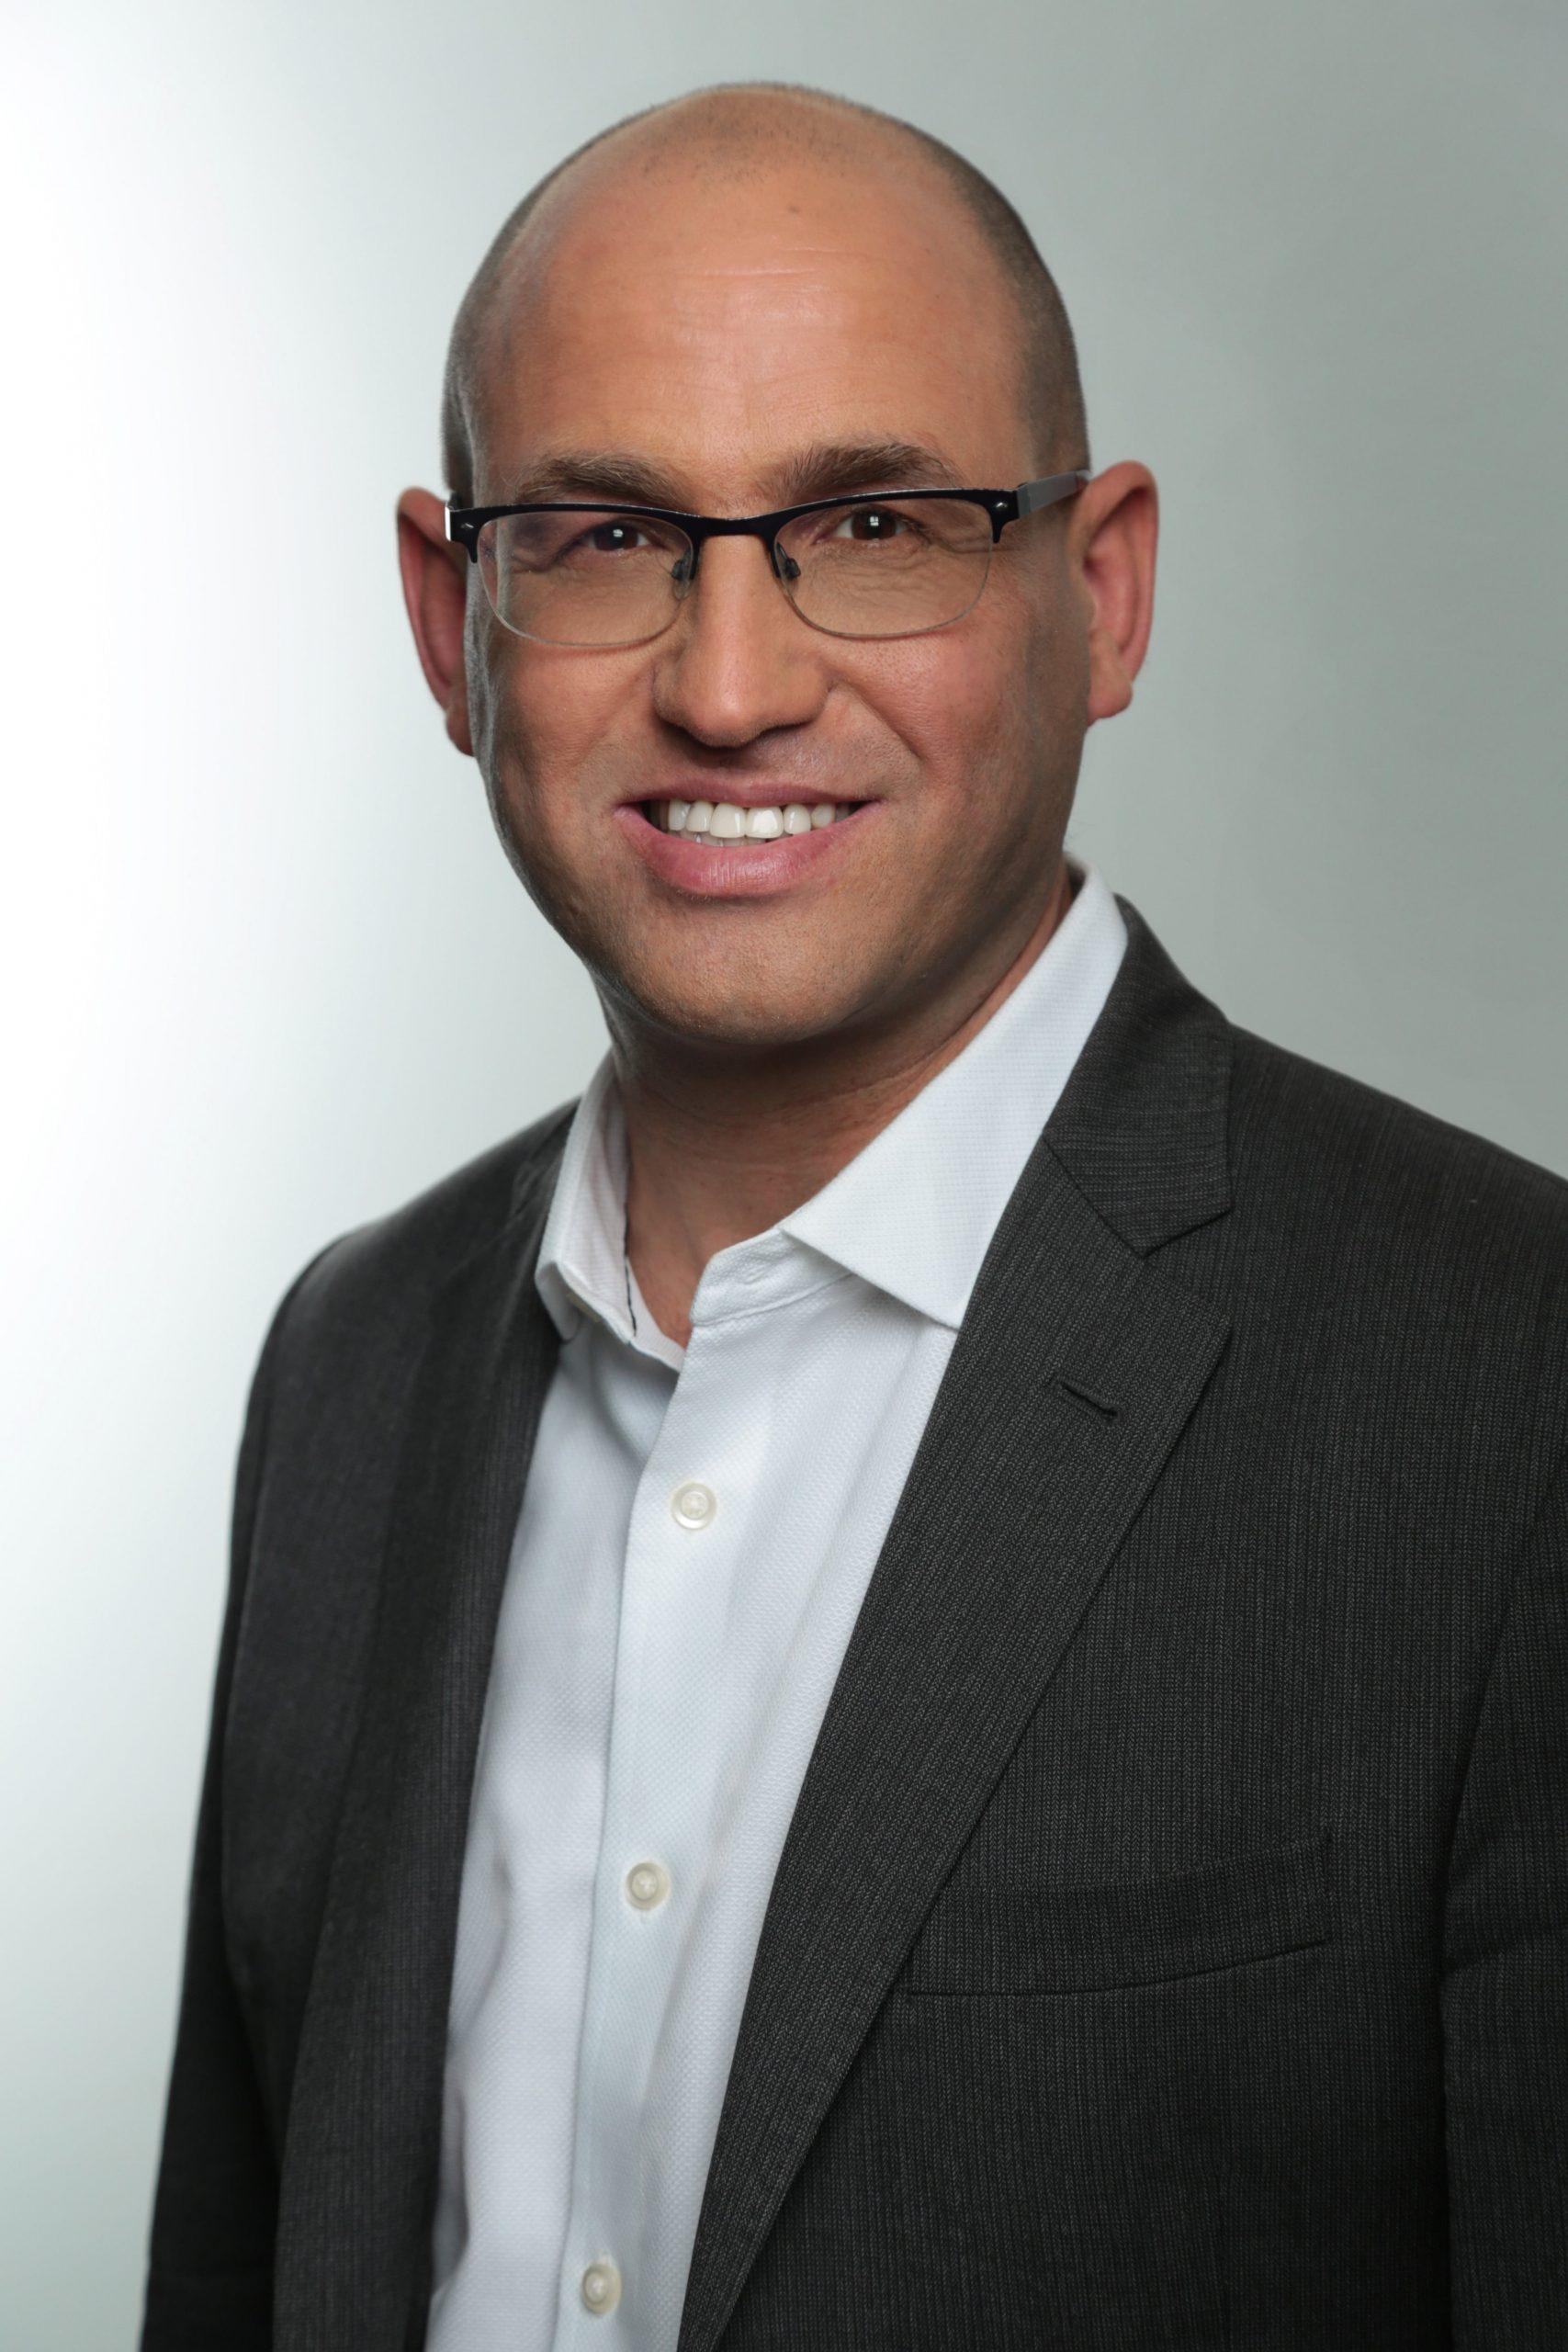 C-Suite spotlight: Alon Shtruzman of Keshet International